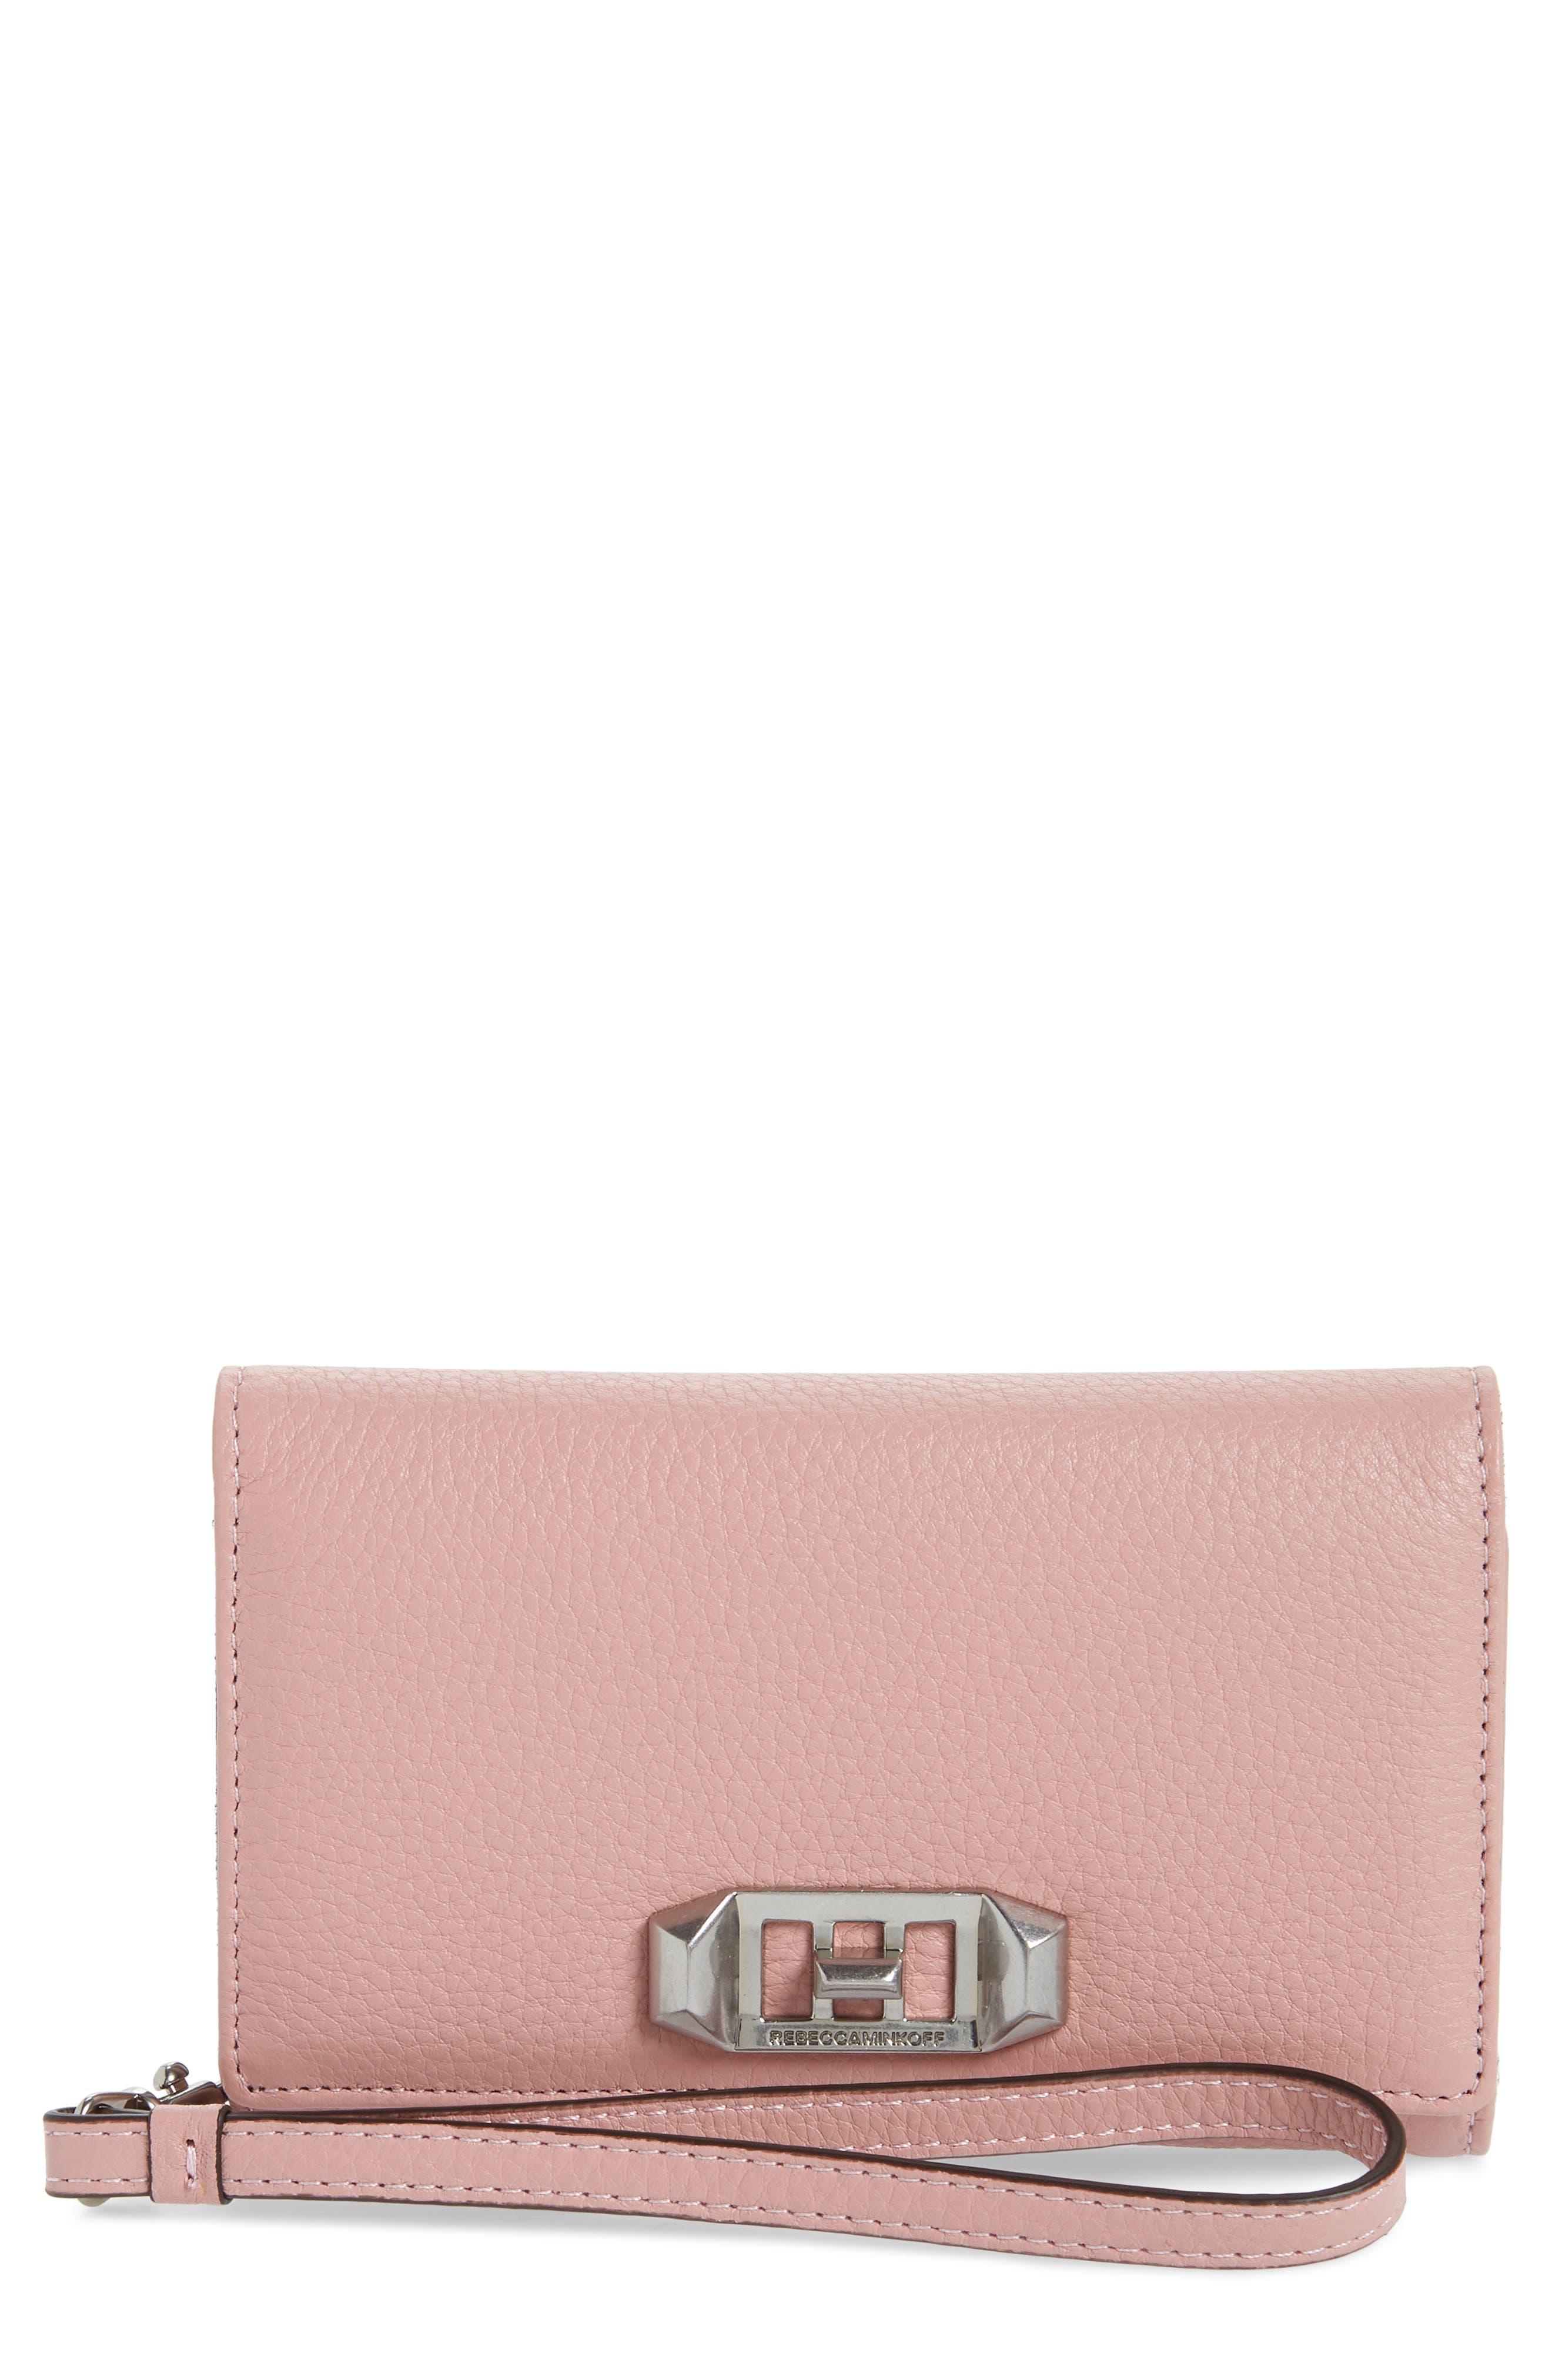 Main Image - Rebecca Minkoff Love Lock iPhone 7/8 & 7/8 Plus Leather Wristlet Folio